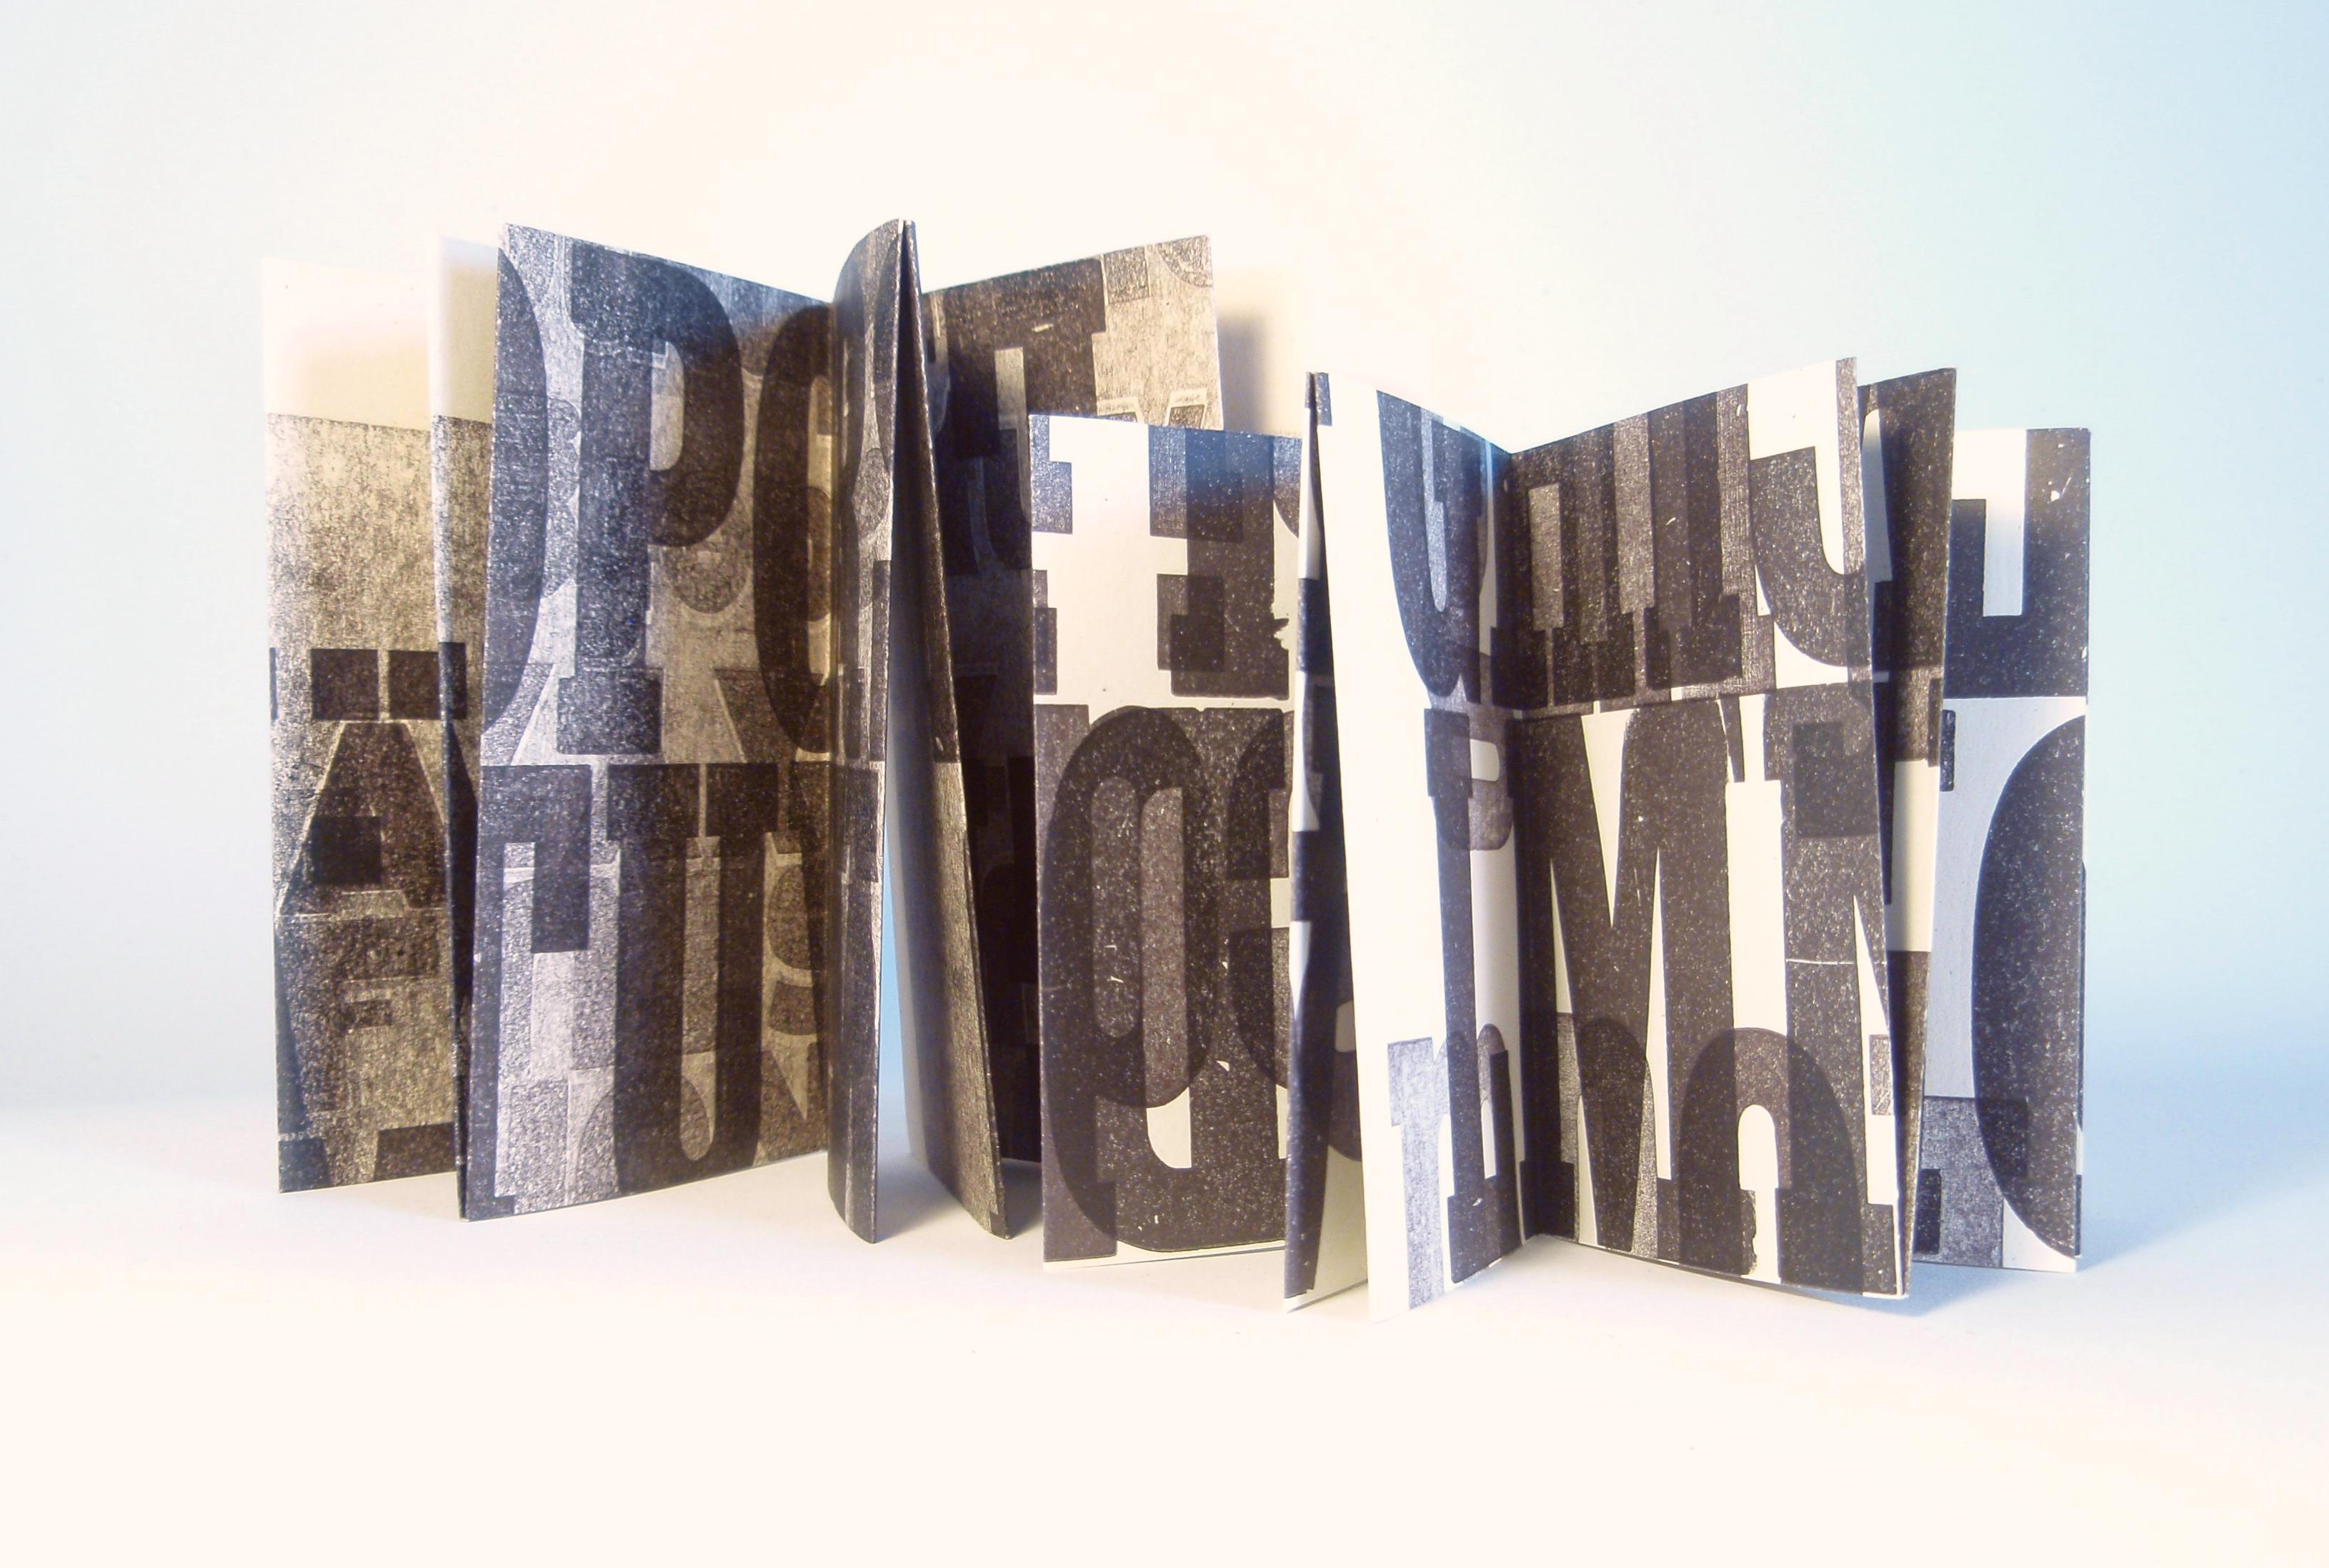 Origami books « Basma Kavanagh - photo#33